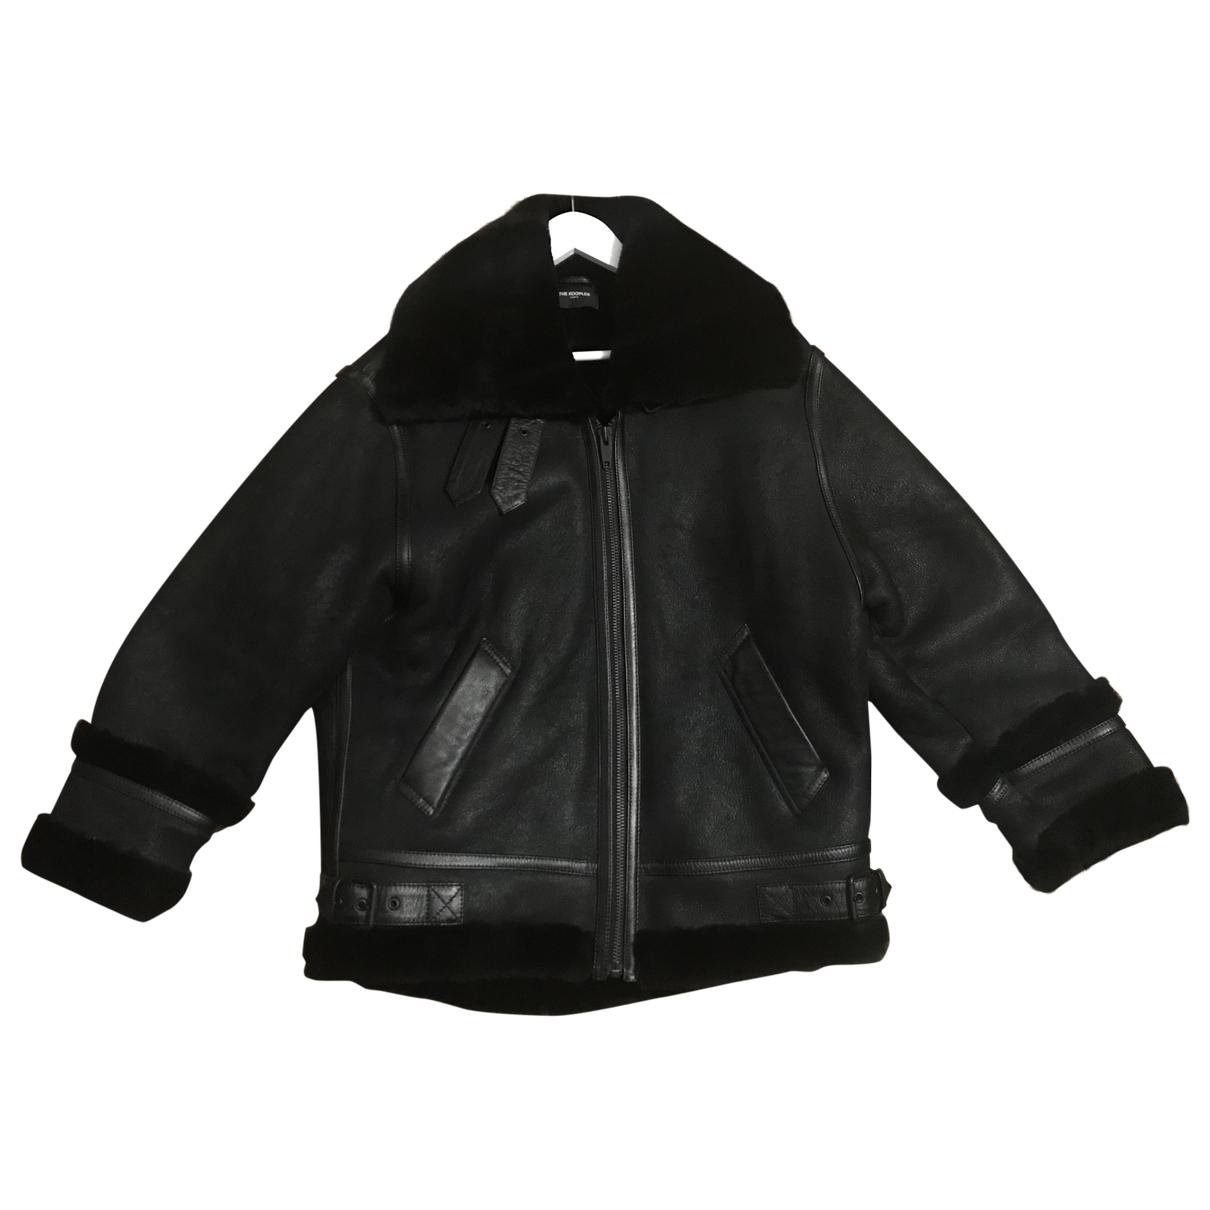 The Kooples Fall Winter 2019 Black Leather coat for Women 38 FR